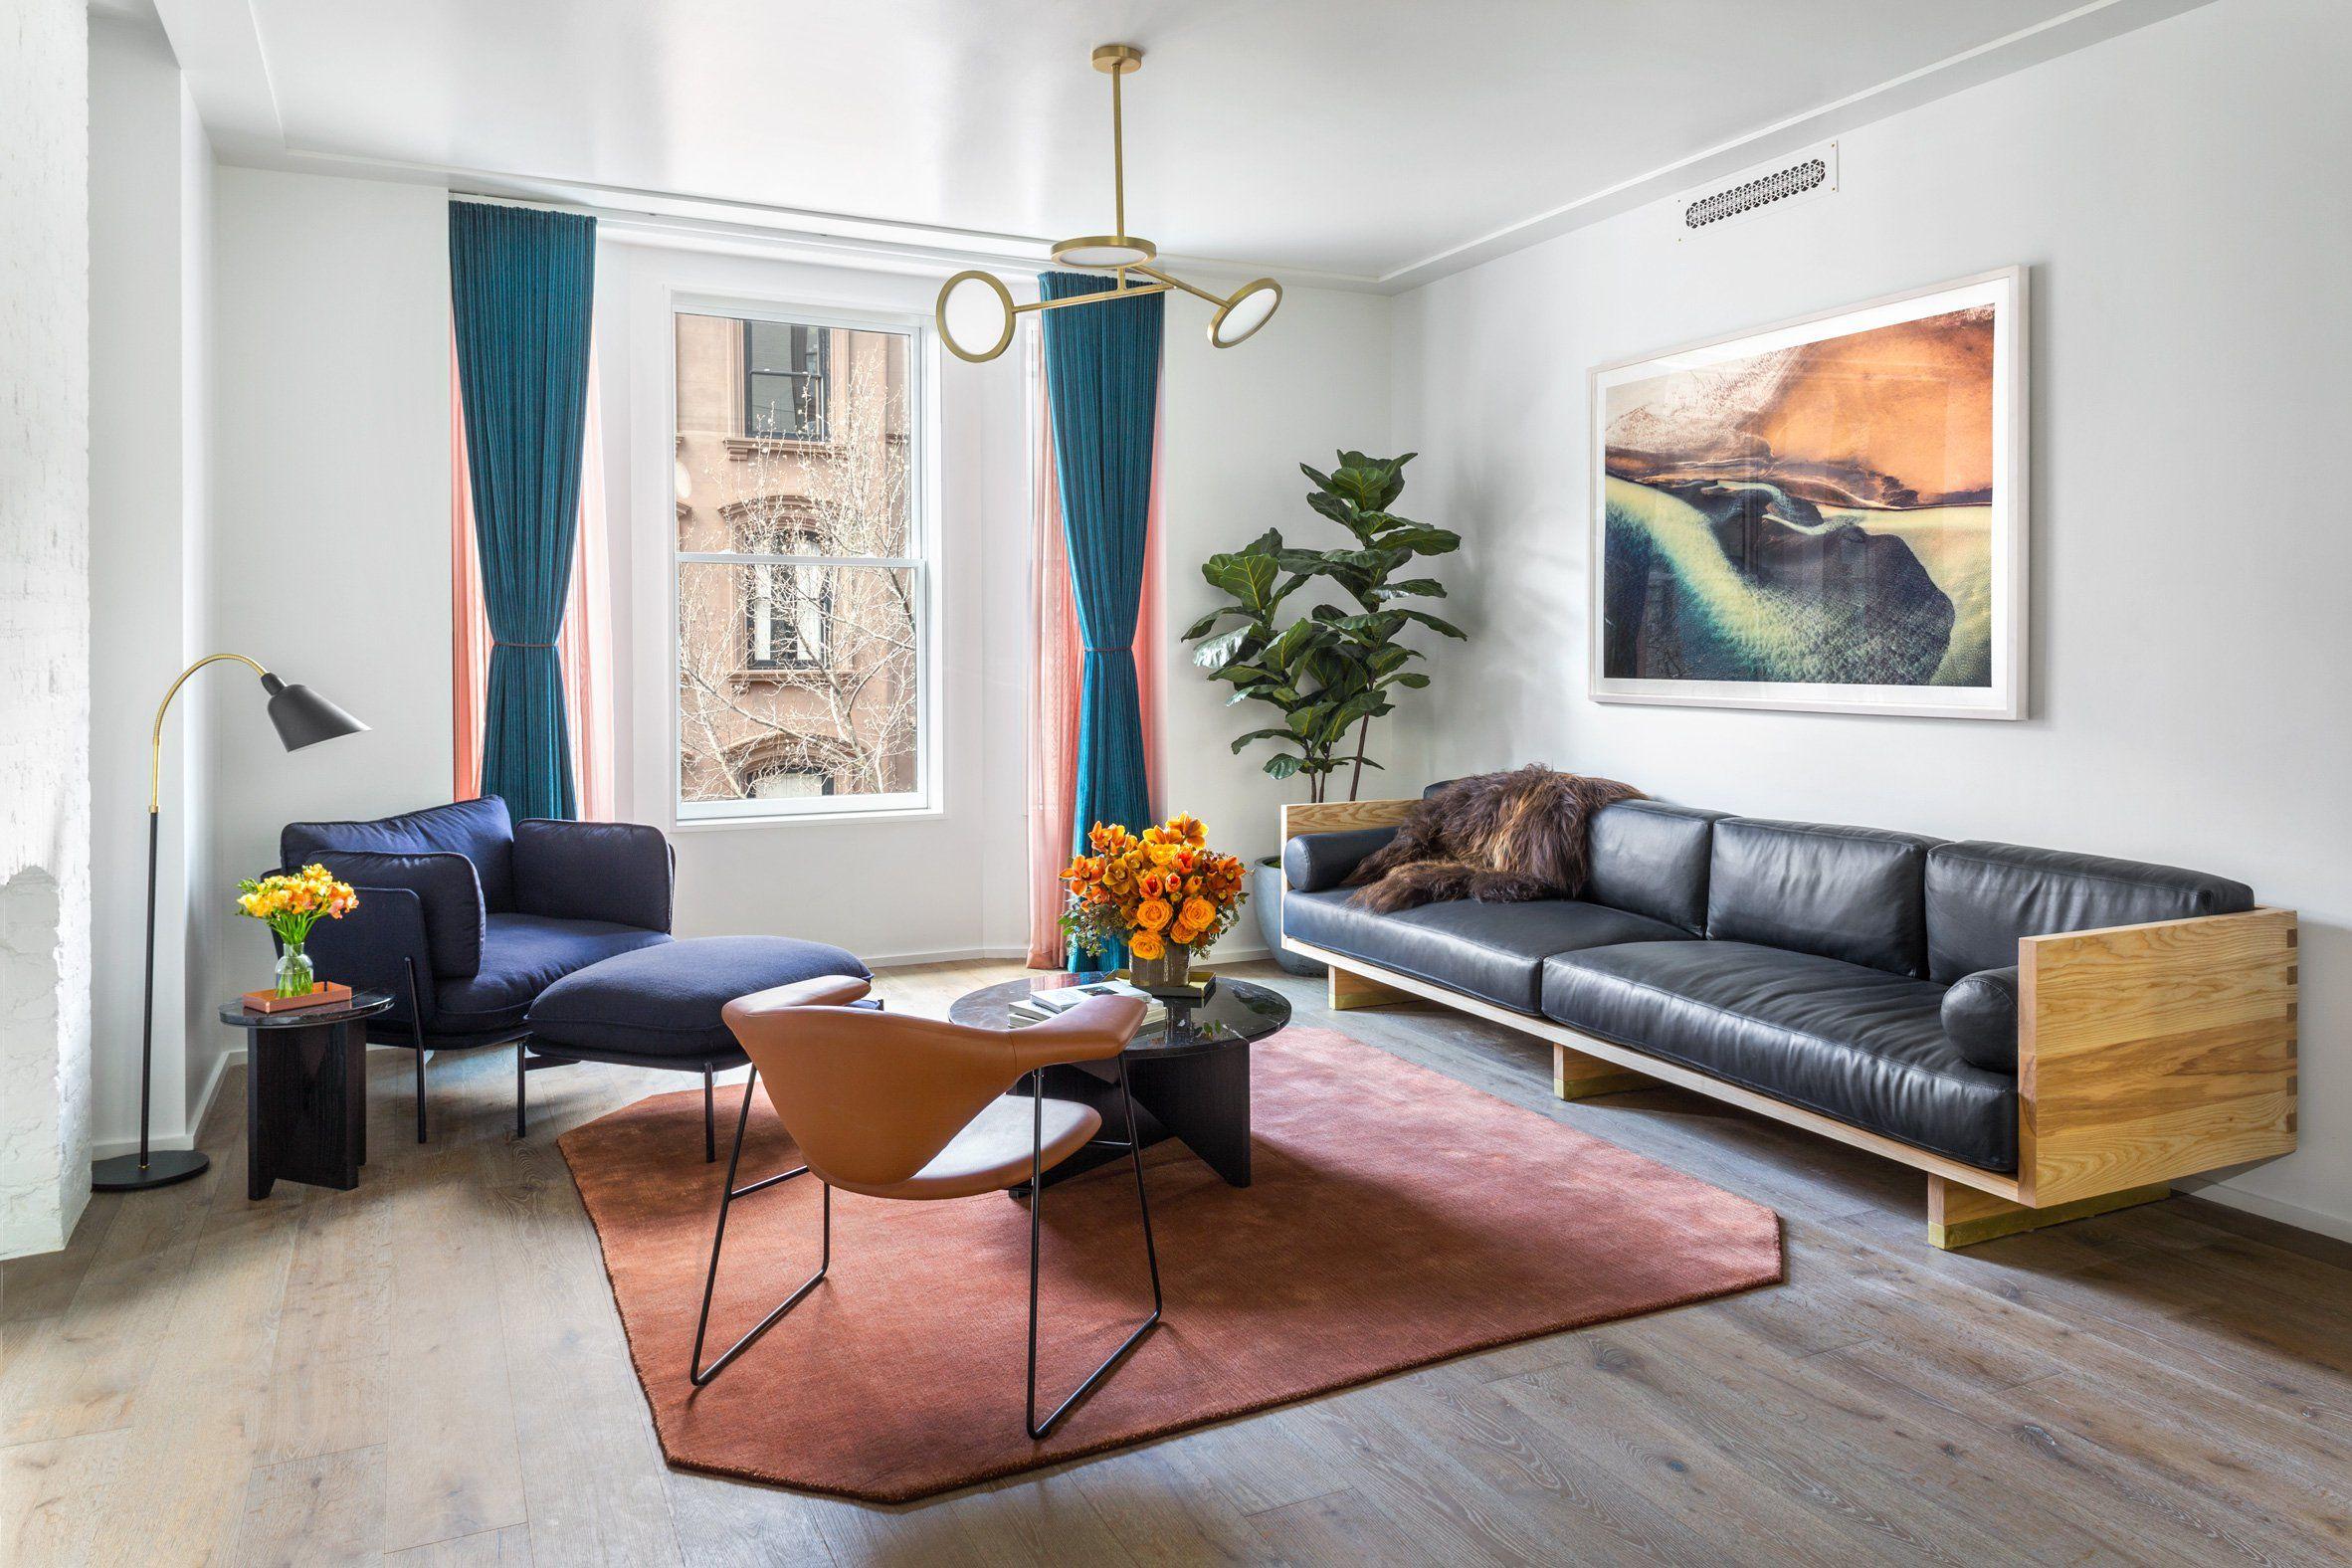 Brooklyn apartment s chic interior design by local studio Matter